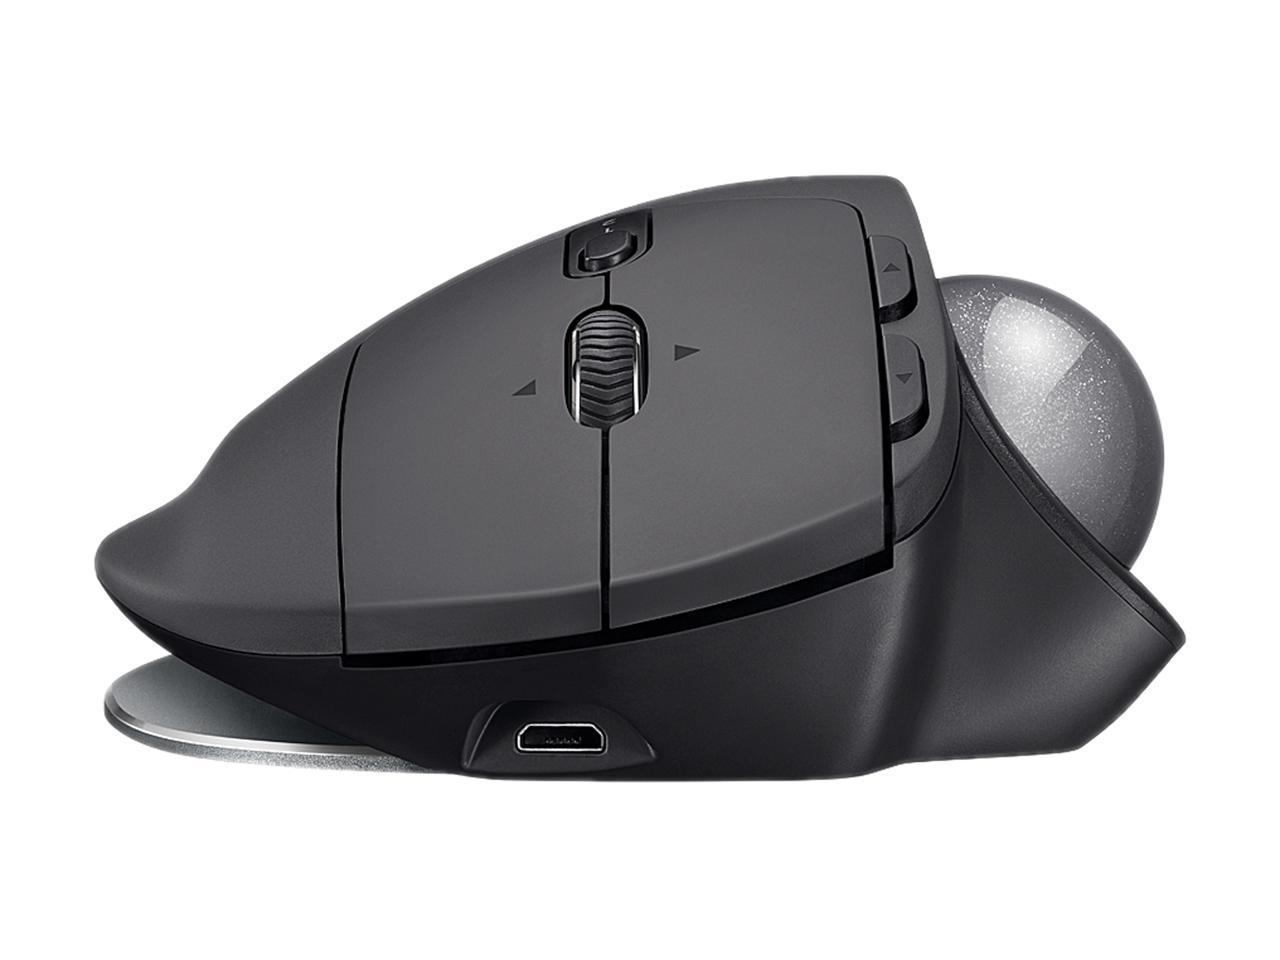 Logitech MX ERGO Advanced Wireless Trackball Mouse – 910-005177